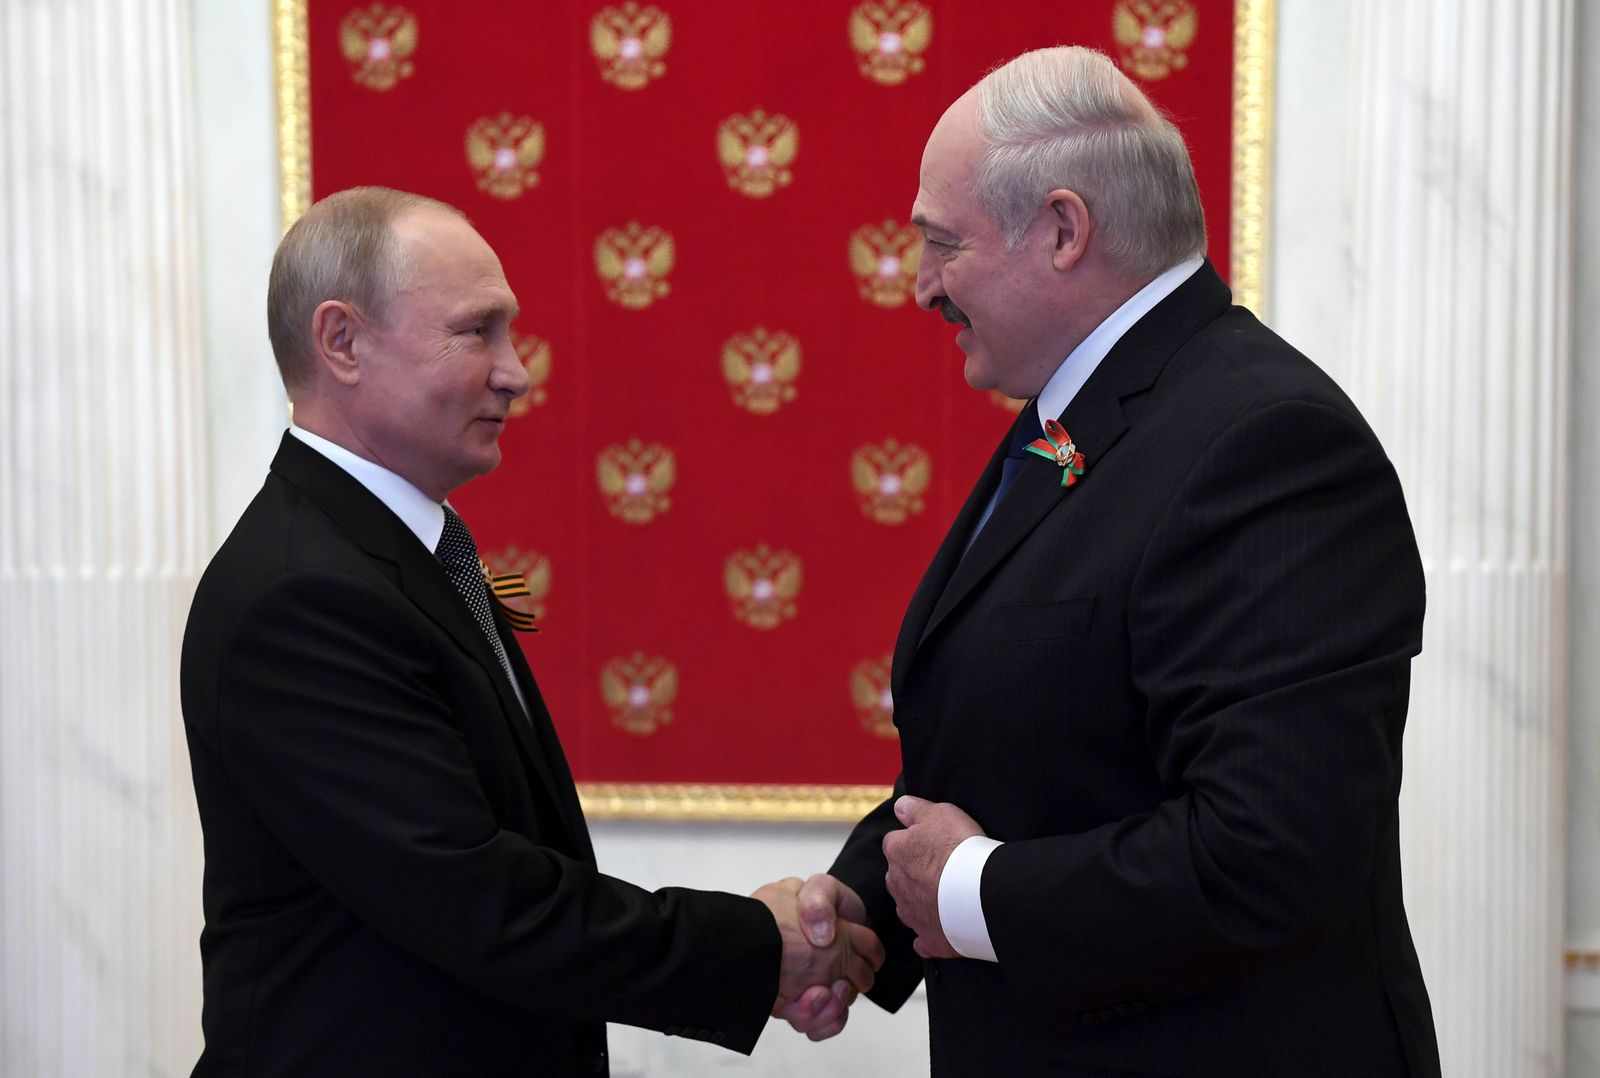 MOSCOW, RUSSIA - JUNE 24, 2020: Russia s President Vladimir Putin (L) and Belarusian President Alexander Lukashenko shak